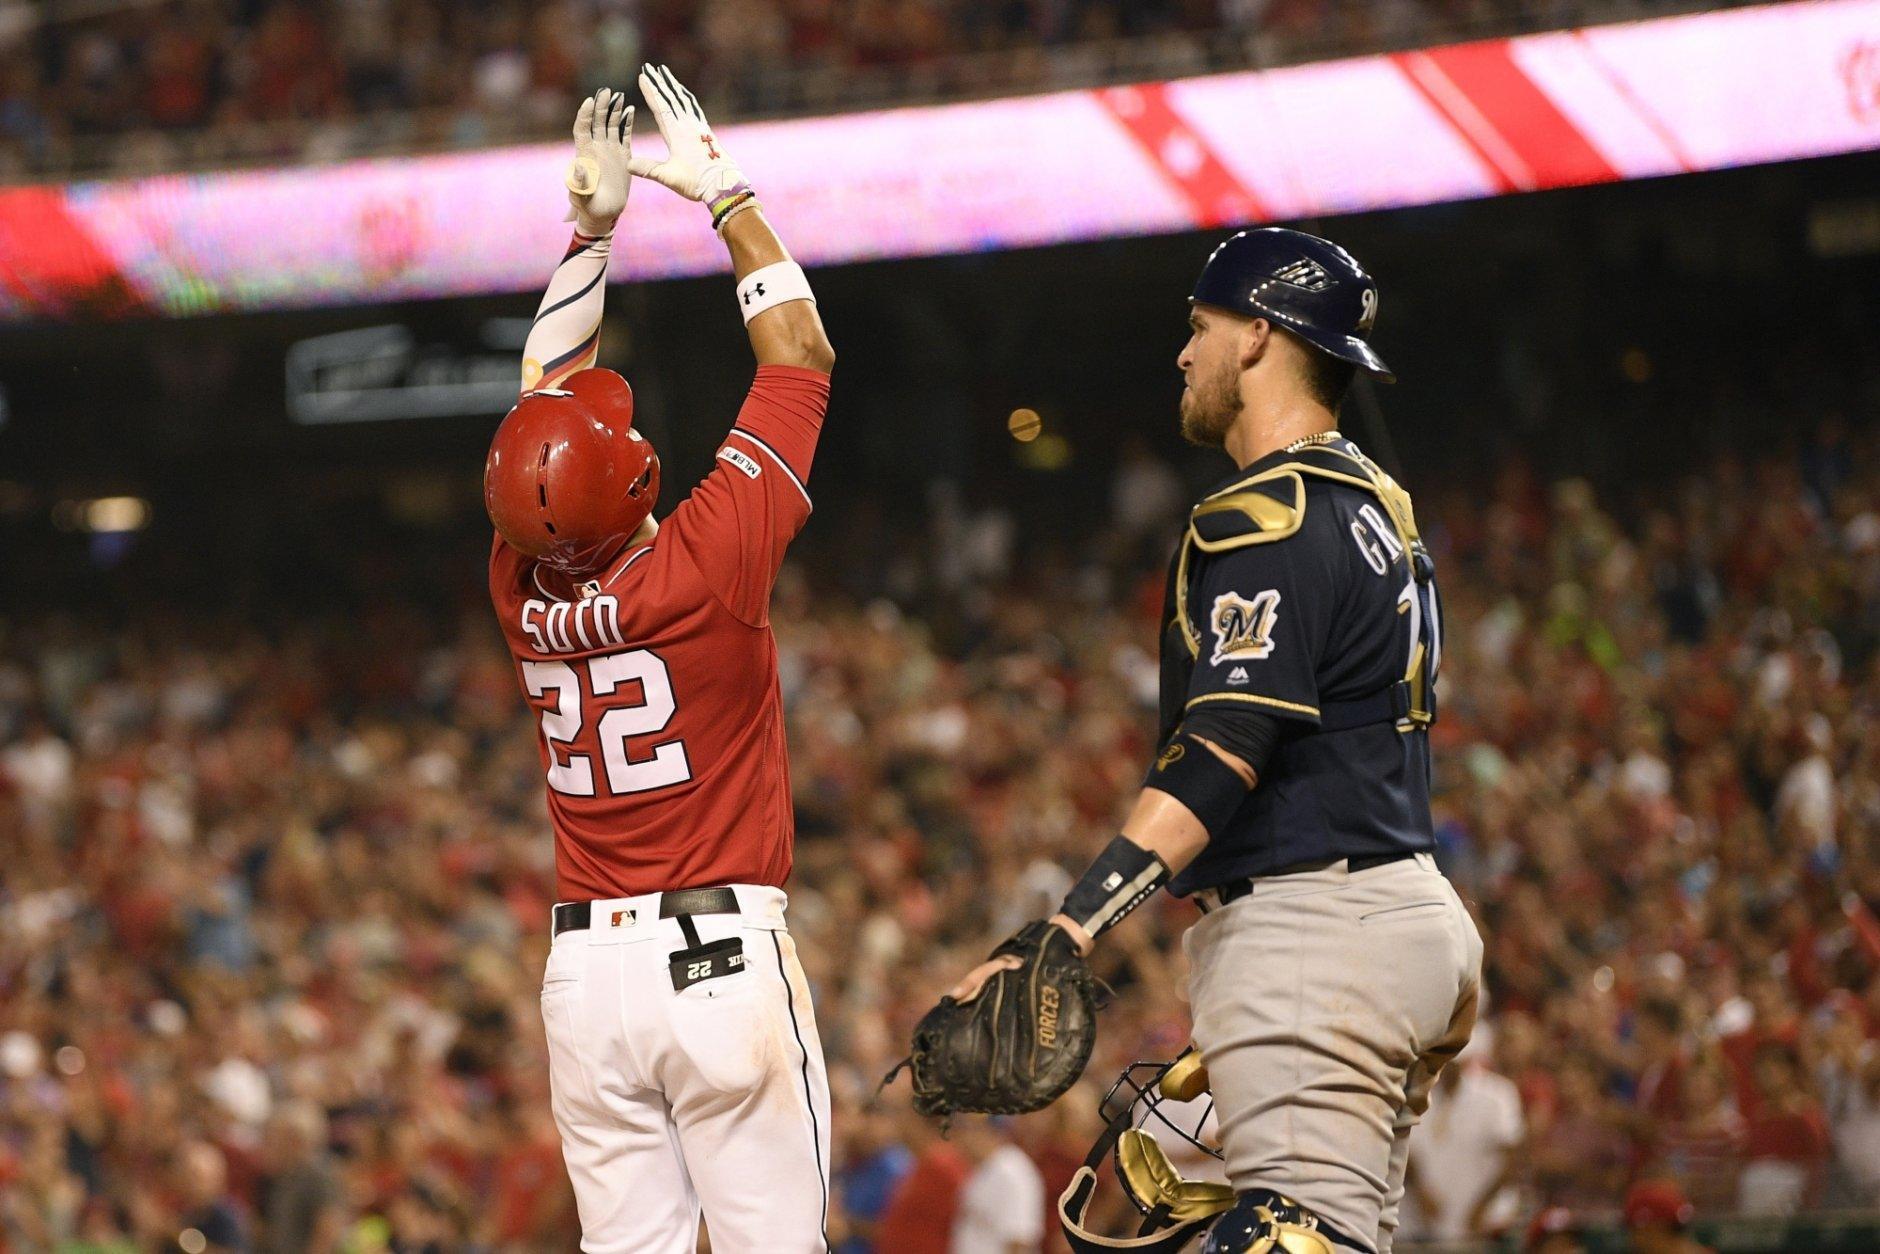 Washington Nationals' Juan Soto (22) celebrates his two-run home run during the third inning of a baseball game, next to Milwaukee Brewers catcher Yasmani Grandal on Saturday, Aug. 17, 2019, in Washington. (AP Photo/Nick Wass)